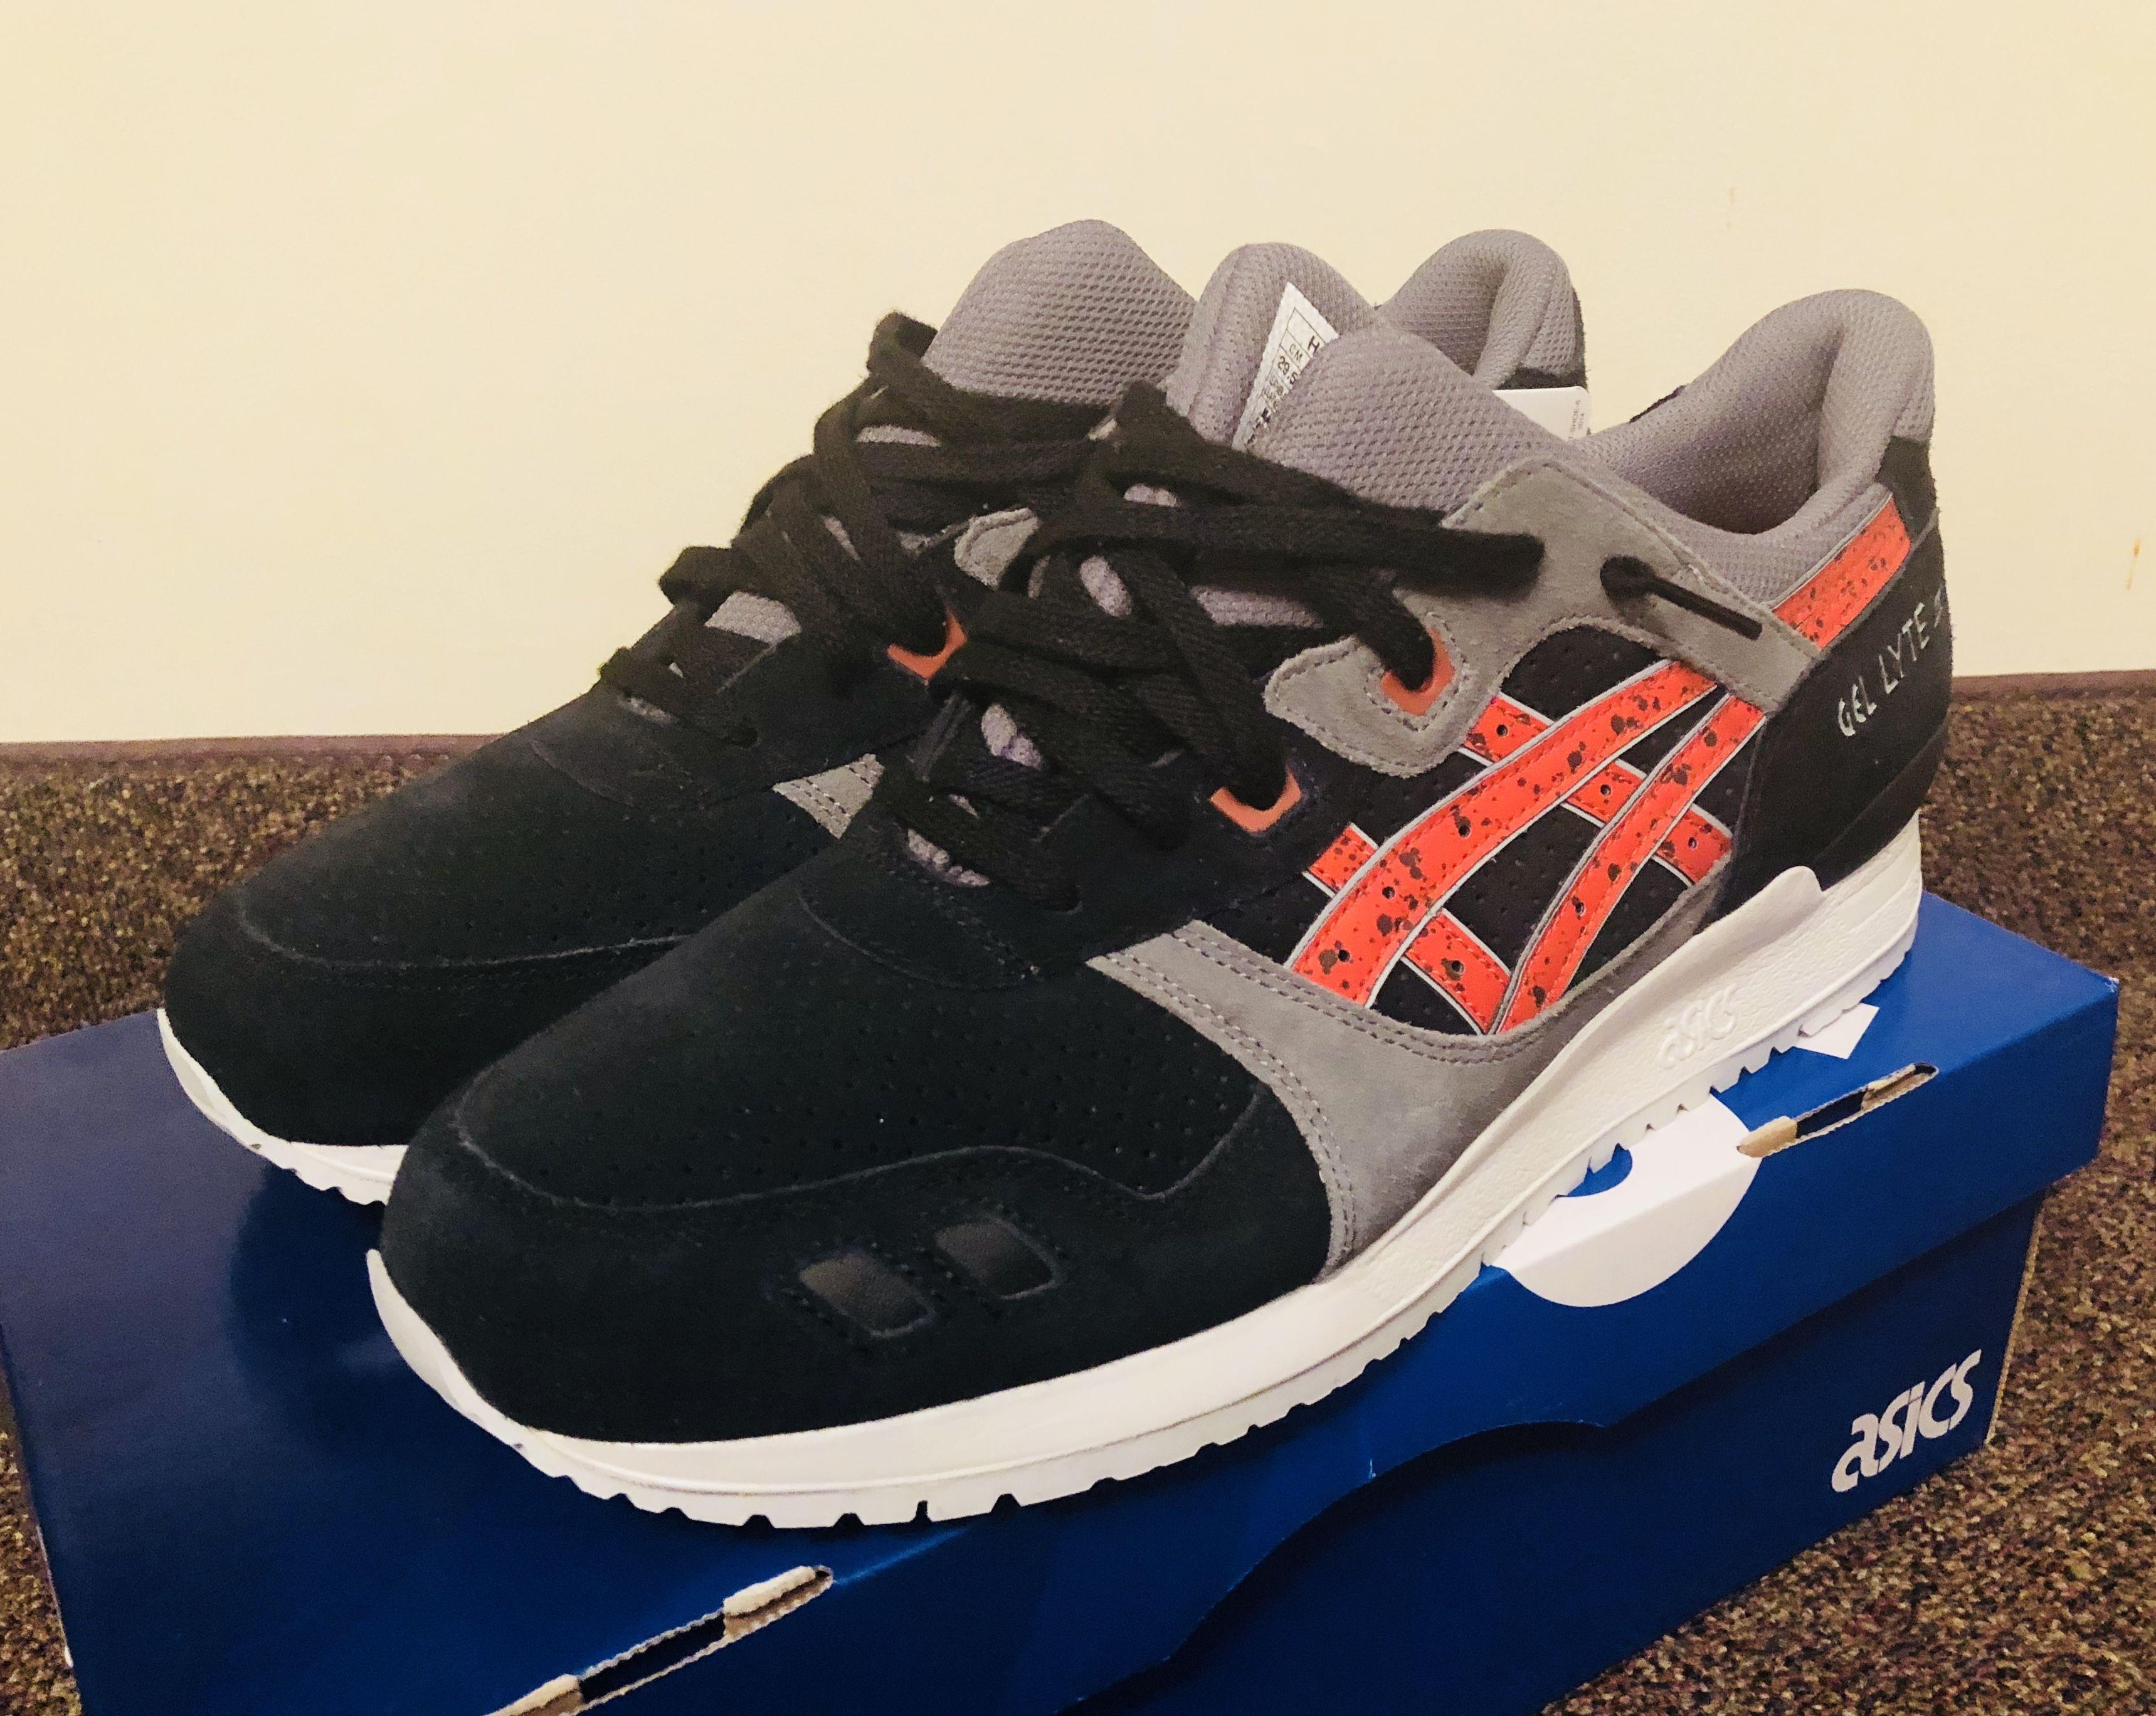 Asics Tiger Men Gel Lyte Lyte III noir chili chili # Men sneakers occasionnels | 5f8e1ae - surgaperawan.info